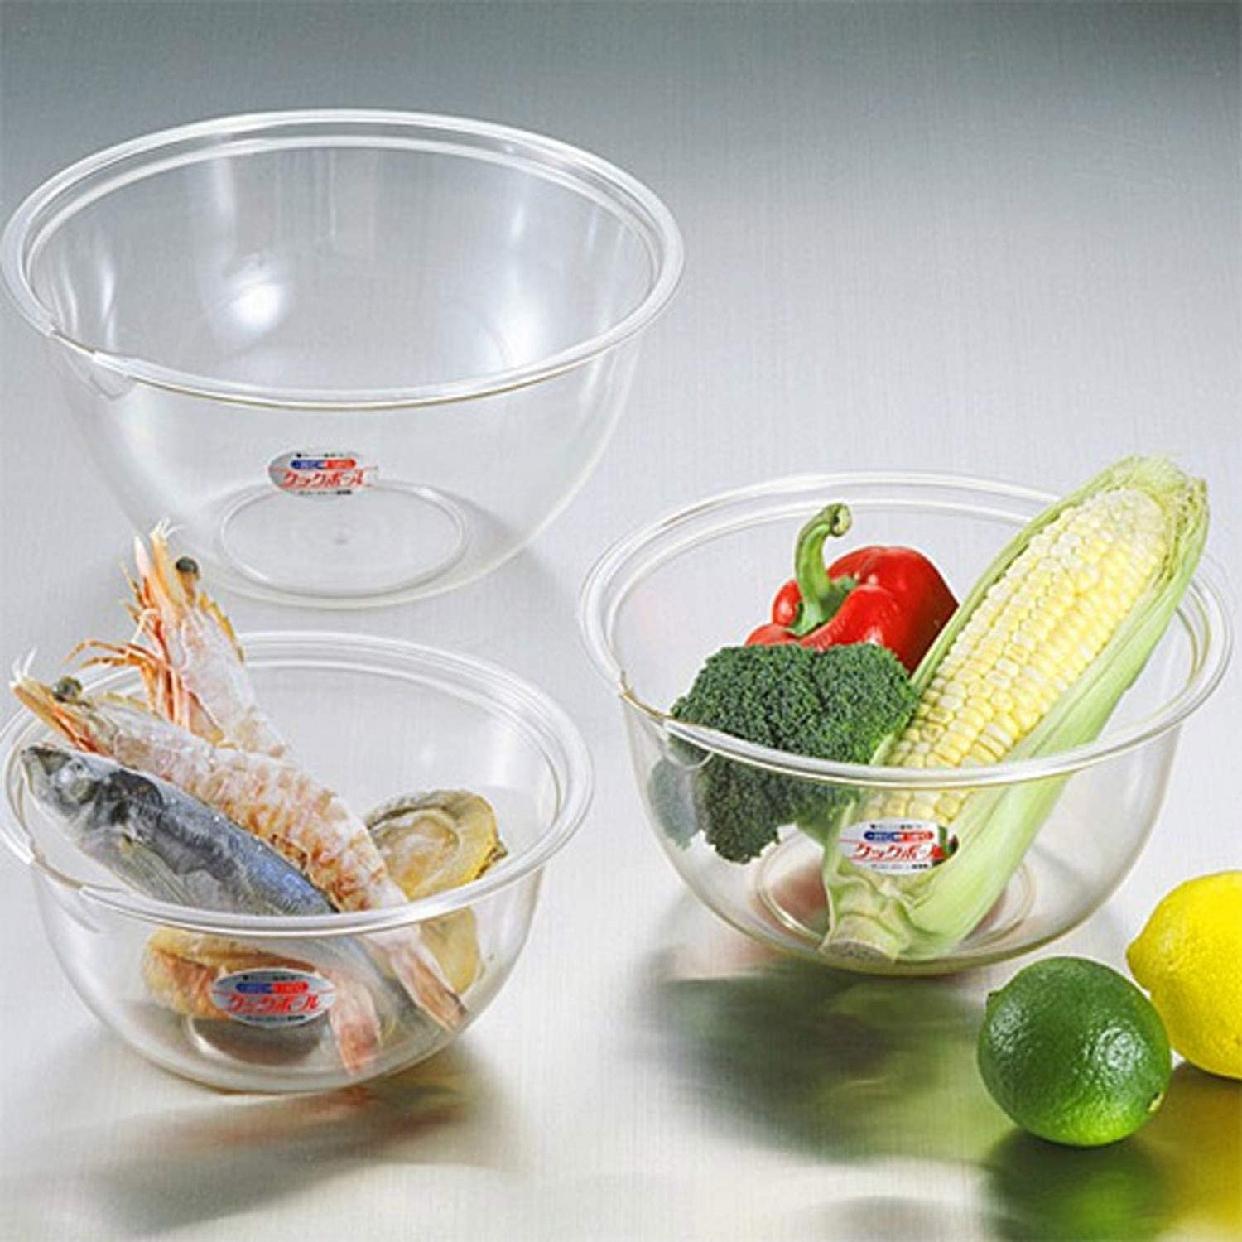 NAGAO(ナガオ) クックボウル セットの商品画像7